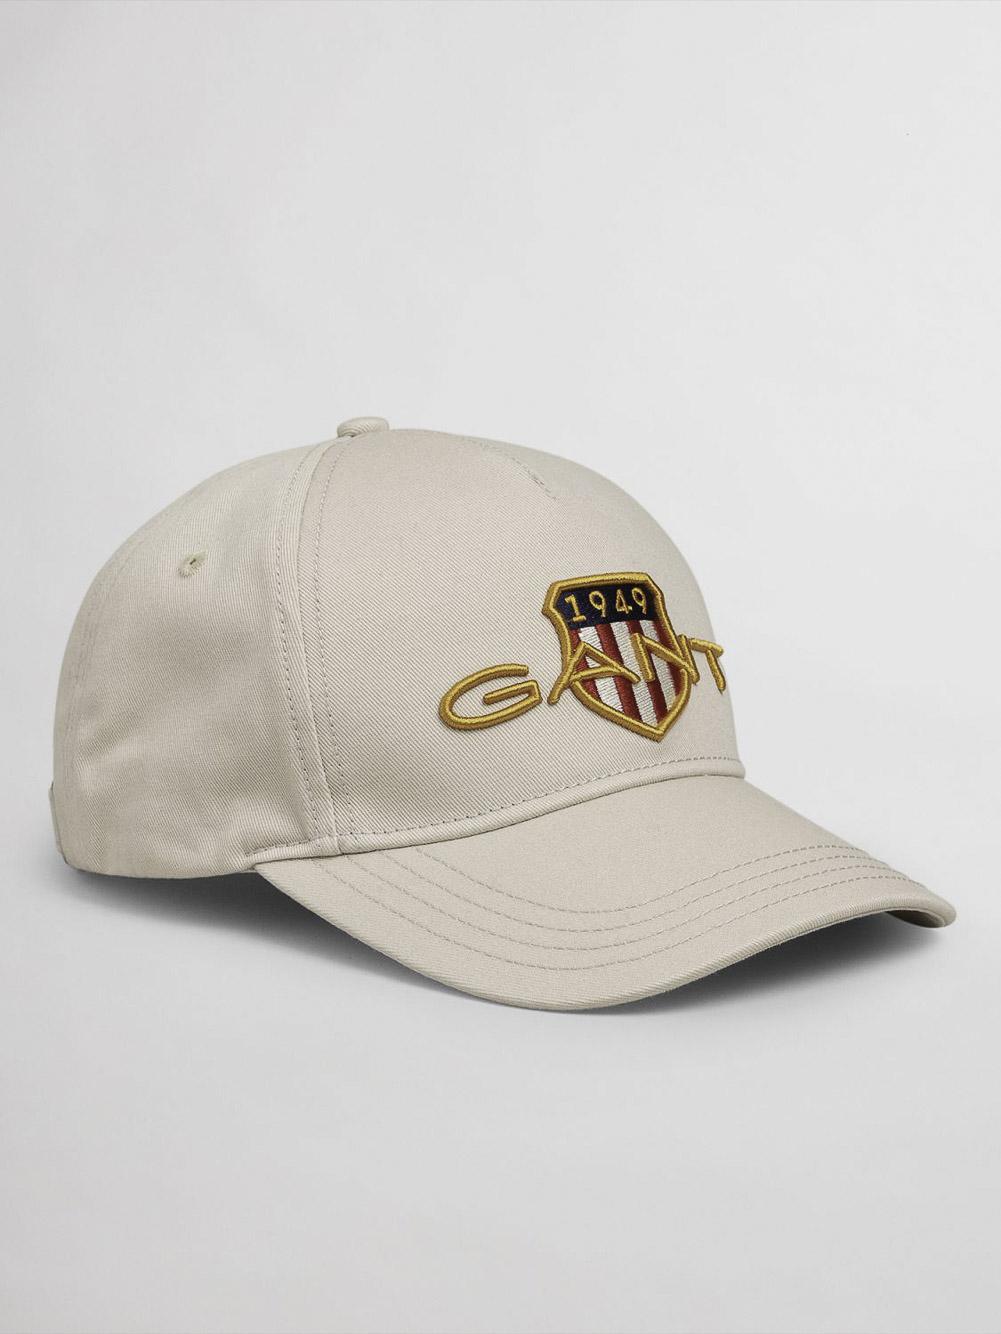 GANT Καπέλο jockey 3G9900056-34 ΜΠΕΖ